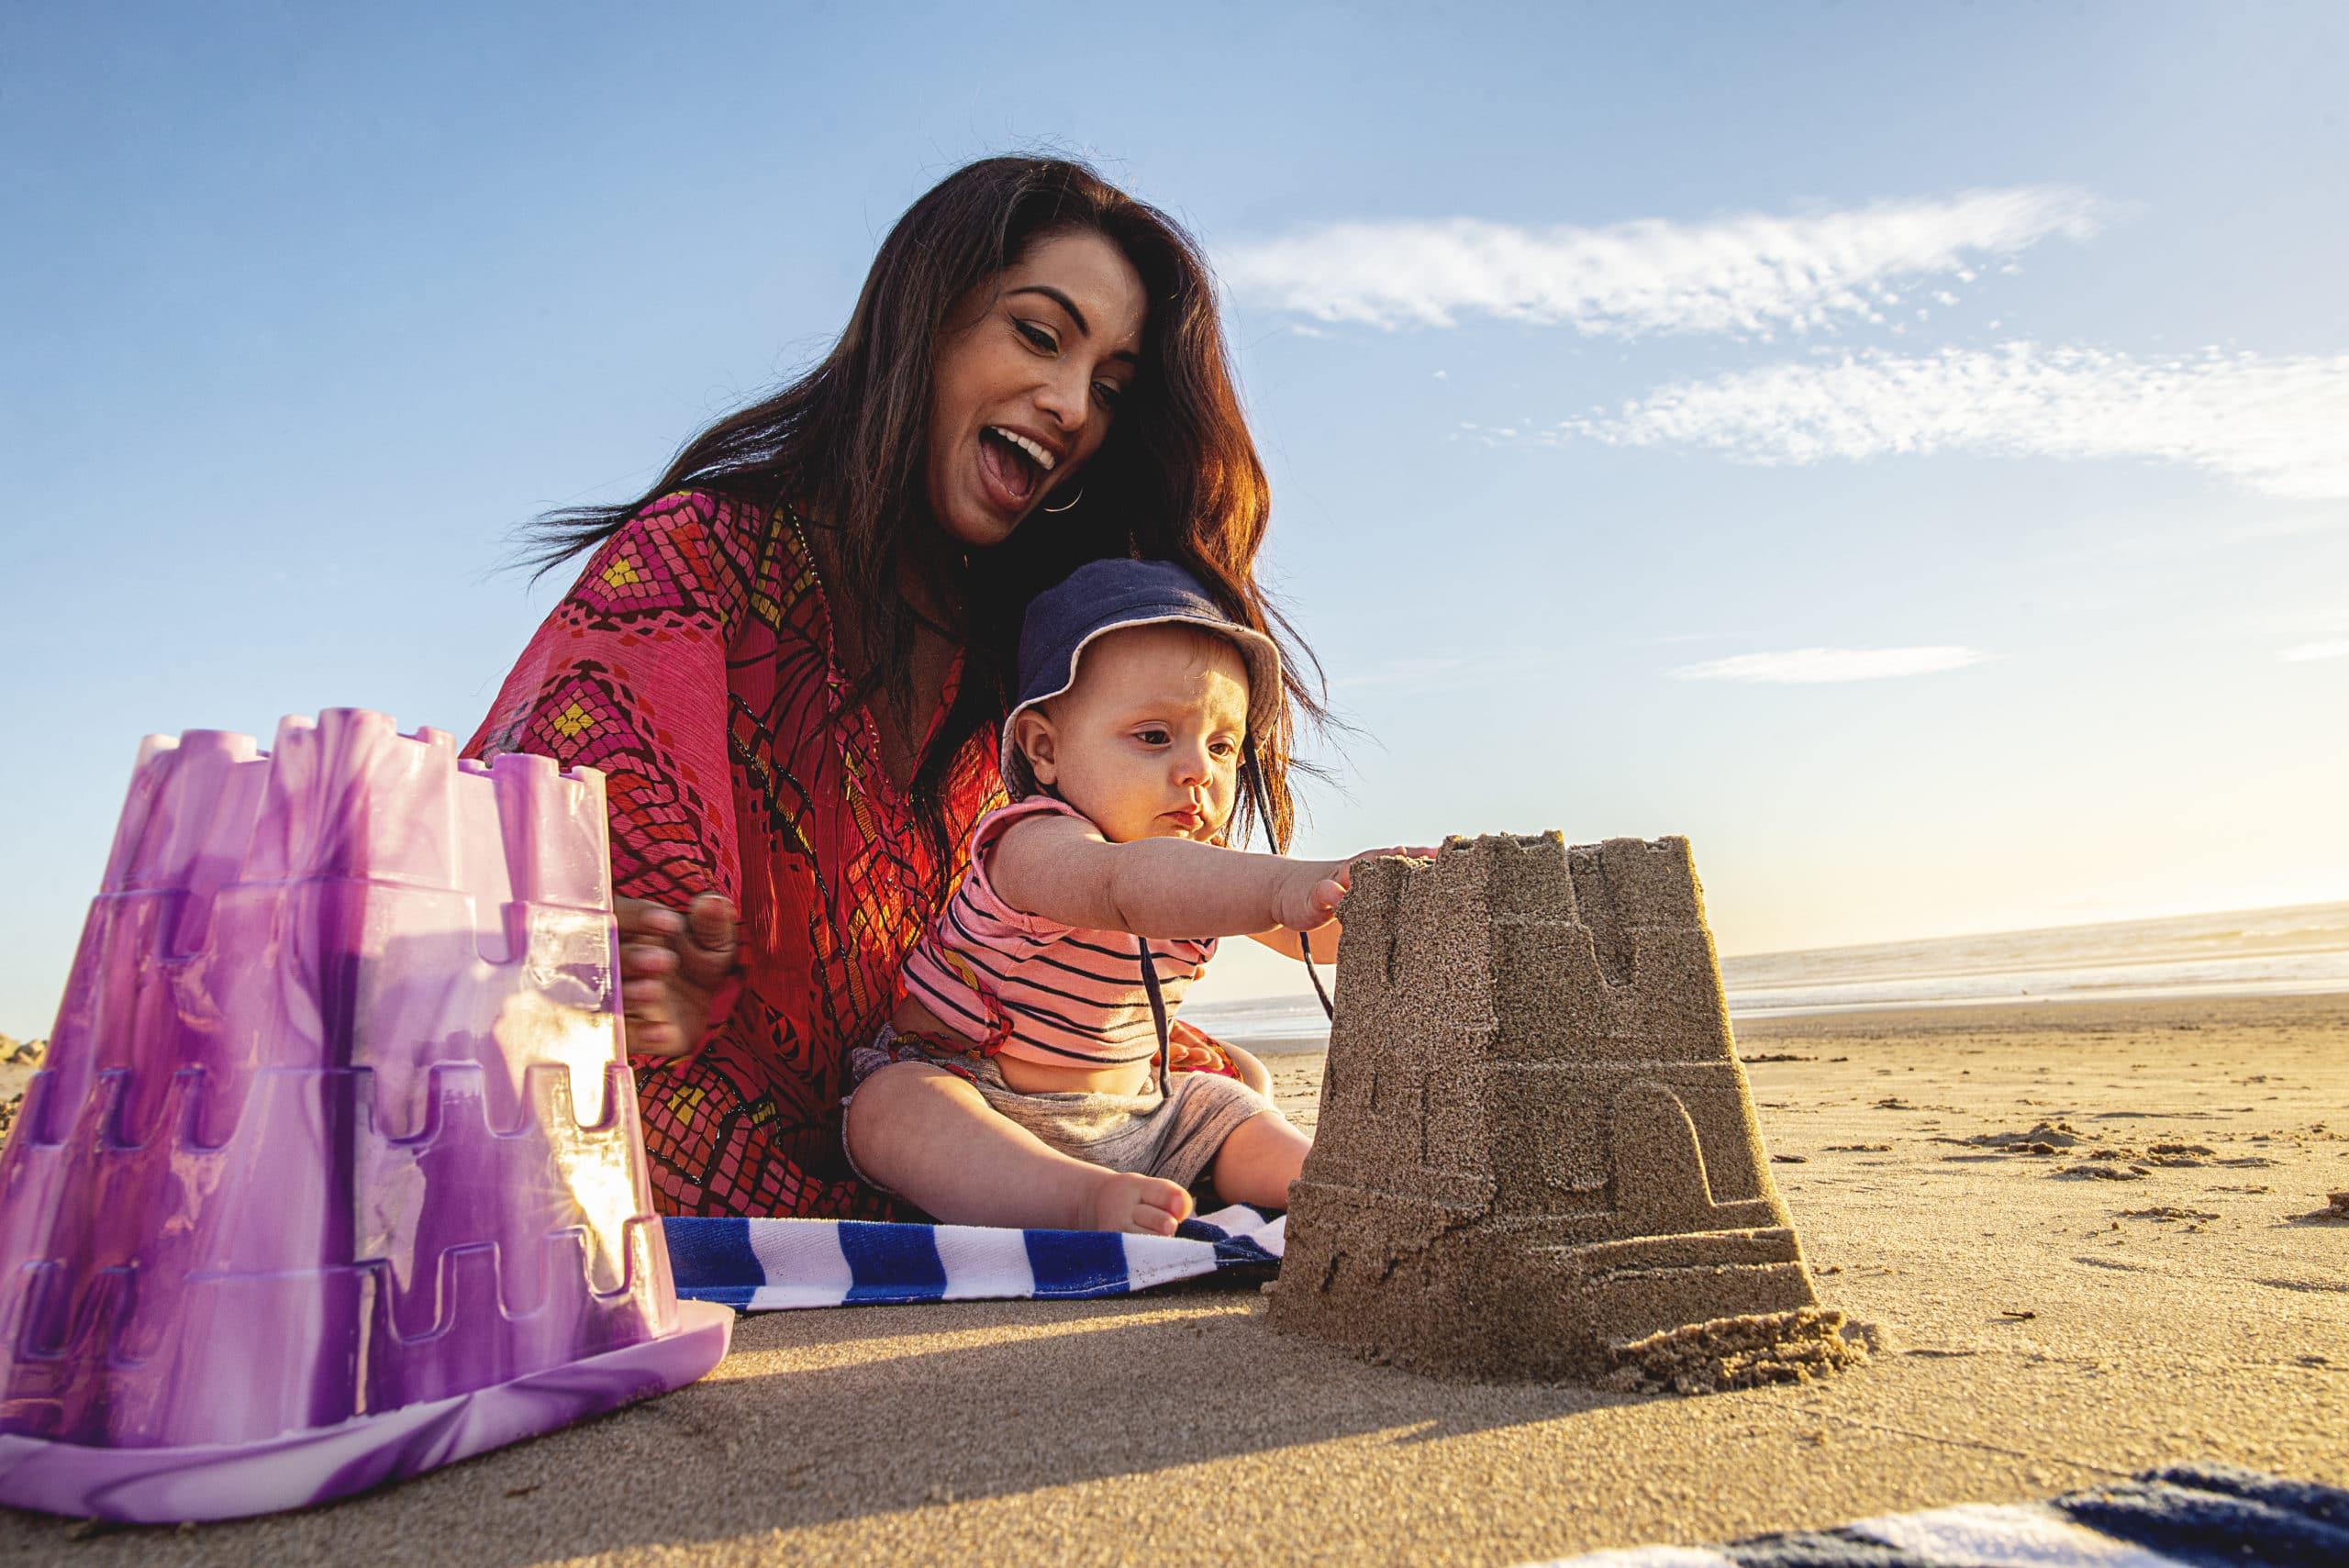 Oxnard_Port Hueneme_Ventura_Beach_Family Time_Landscape (13)